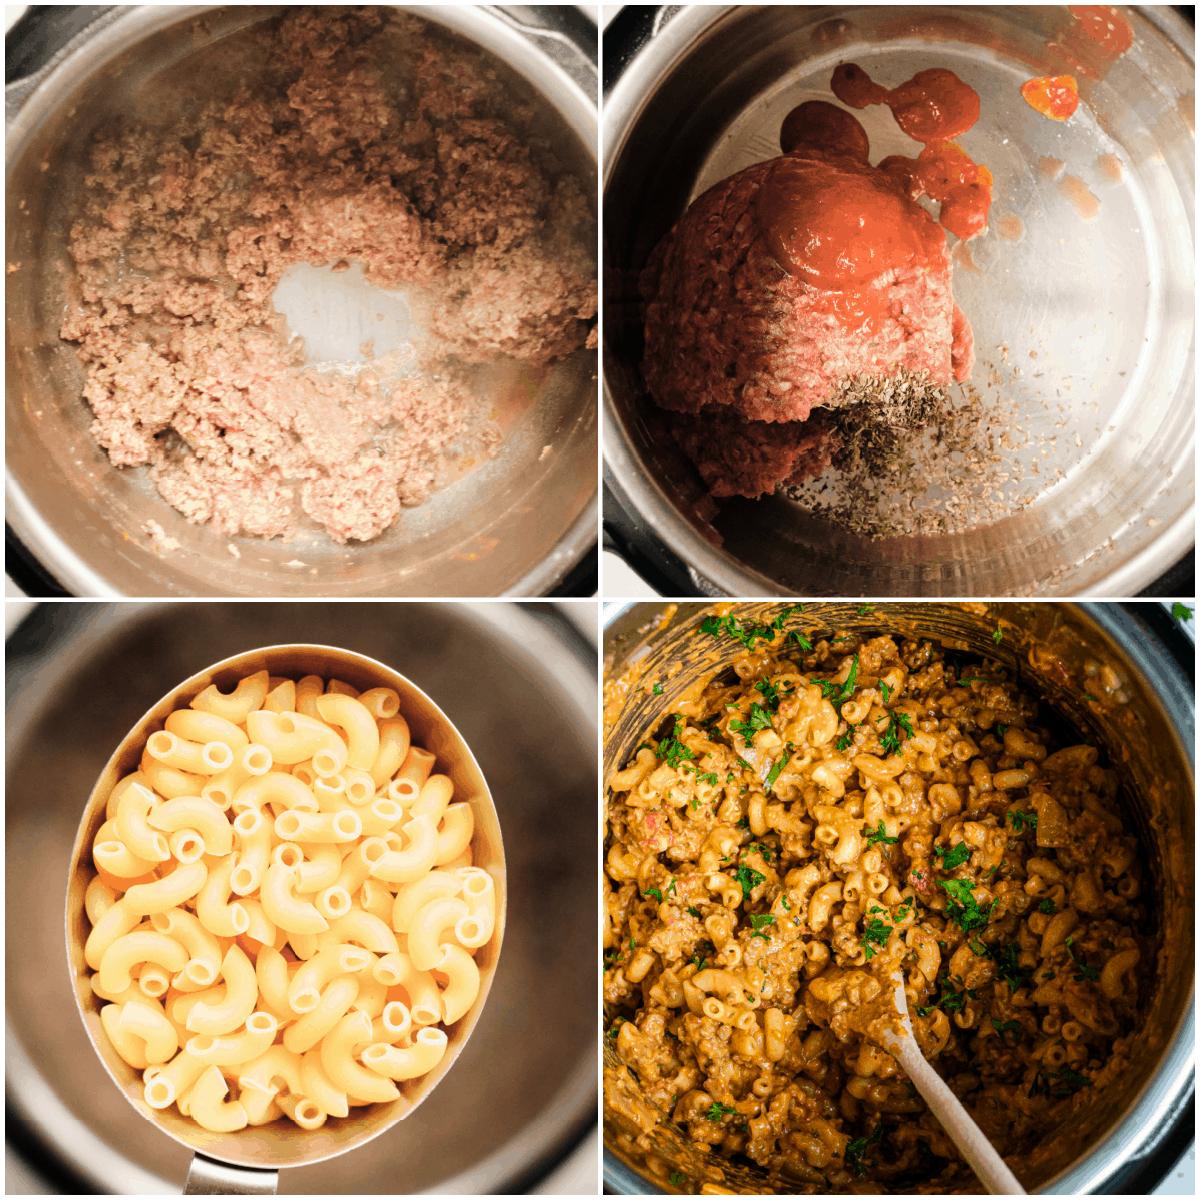 image collage showing the steps for making instant pot hamburger helper